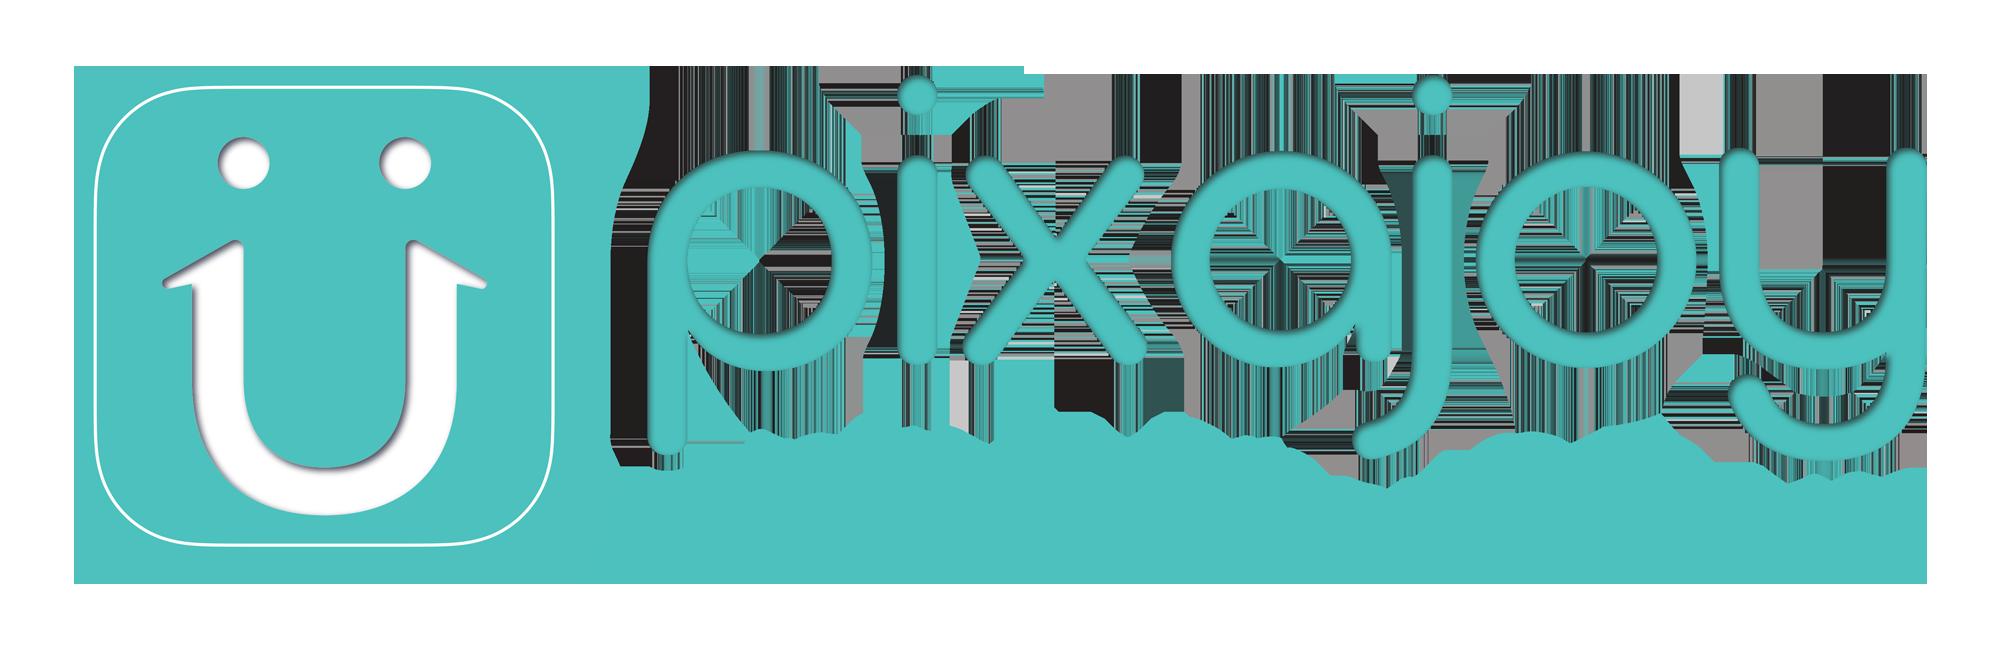 Pixajoy